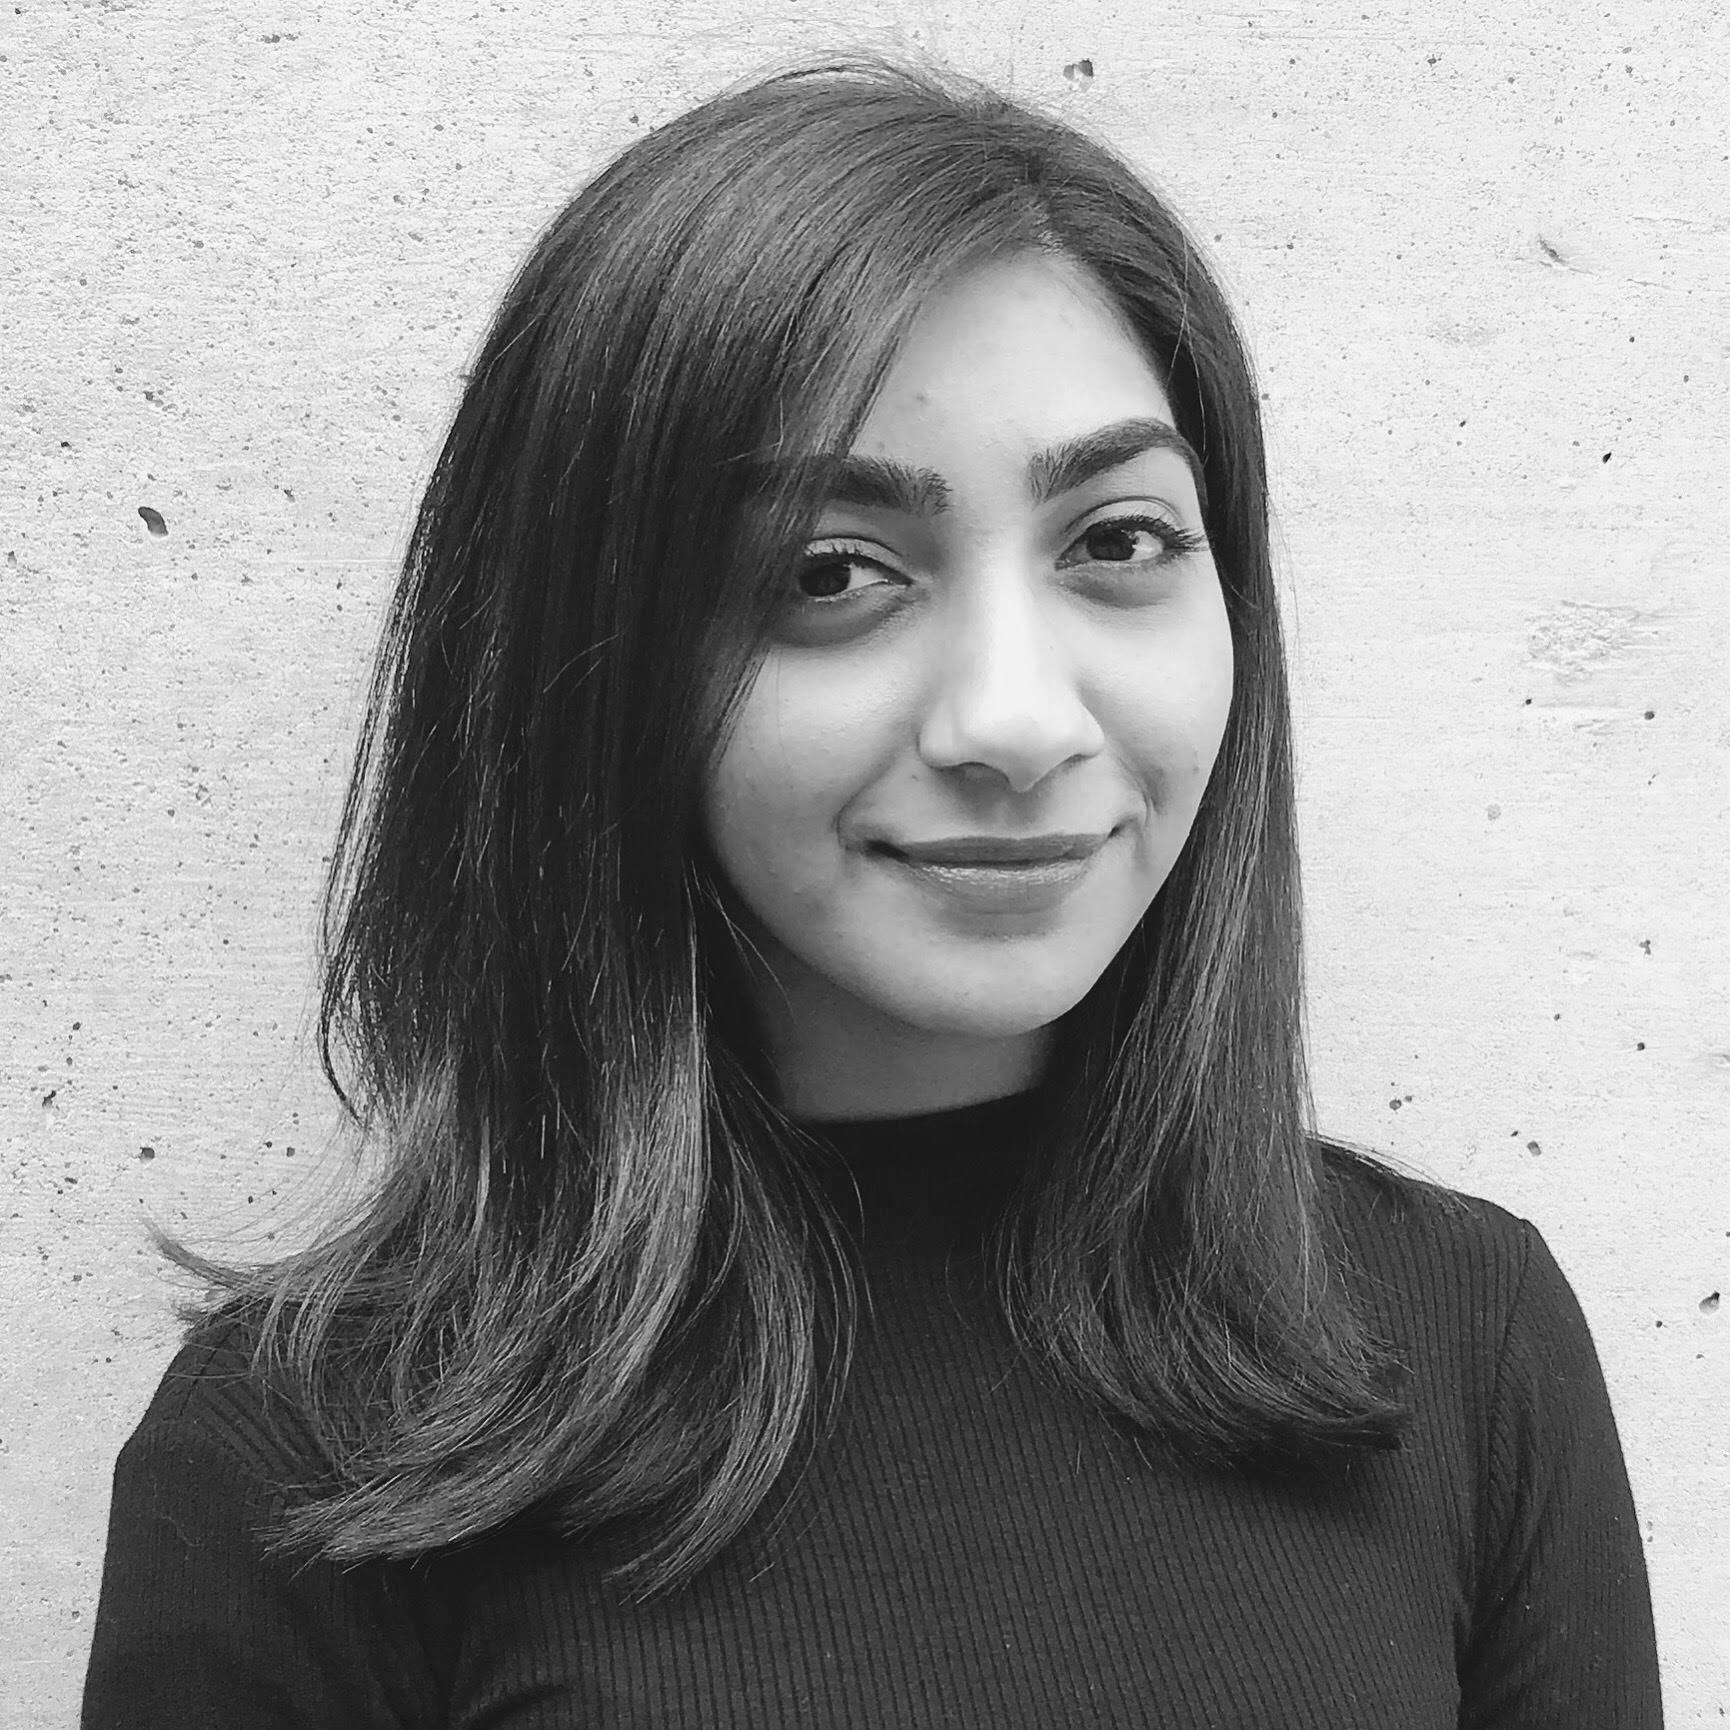 Sidra Fatima • Los Angeles, CA  Master in Urban Planning '19 • Harvard Graduate School of Design